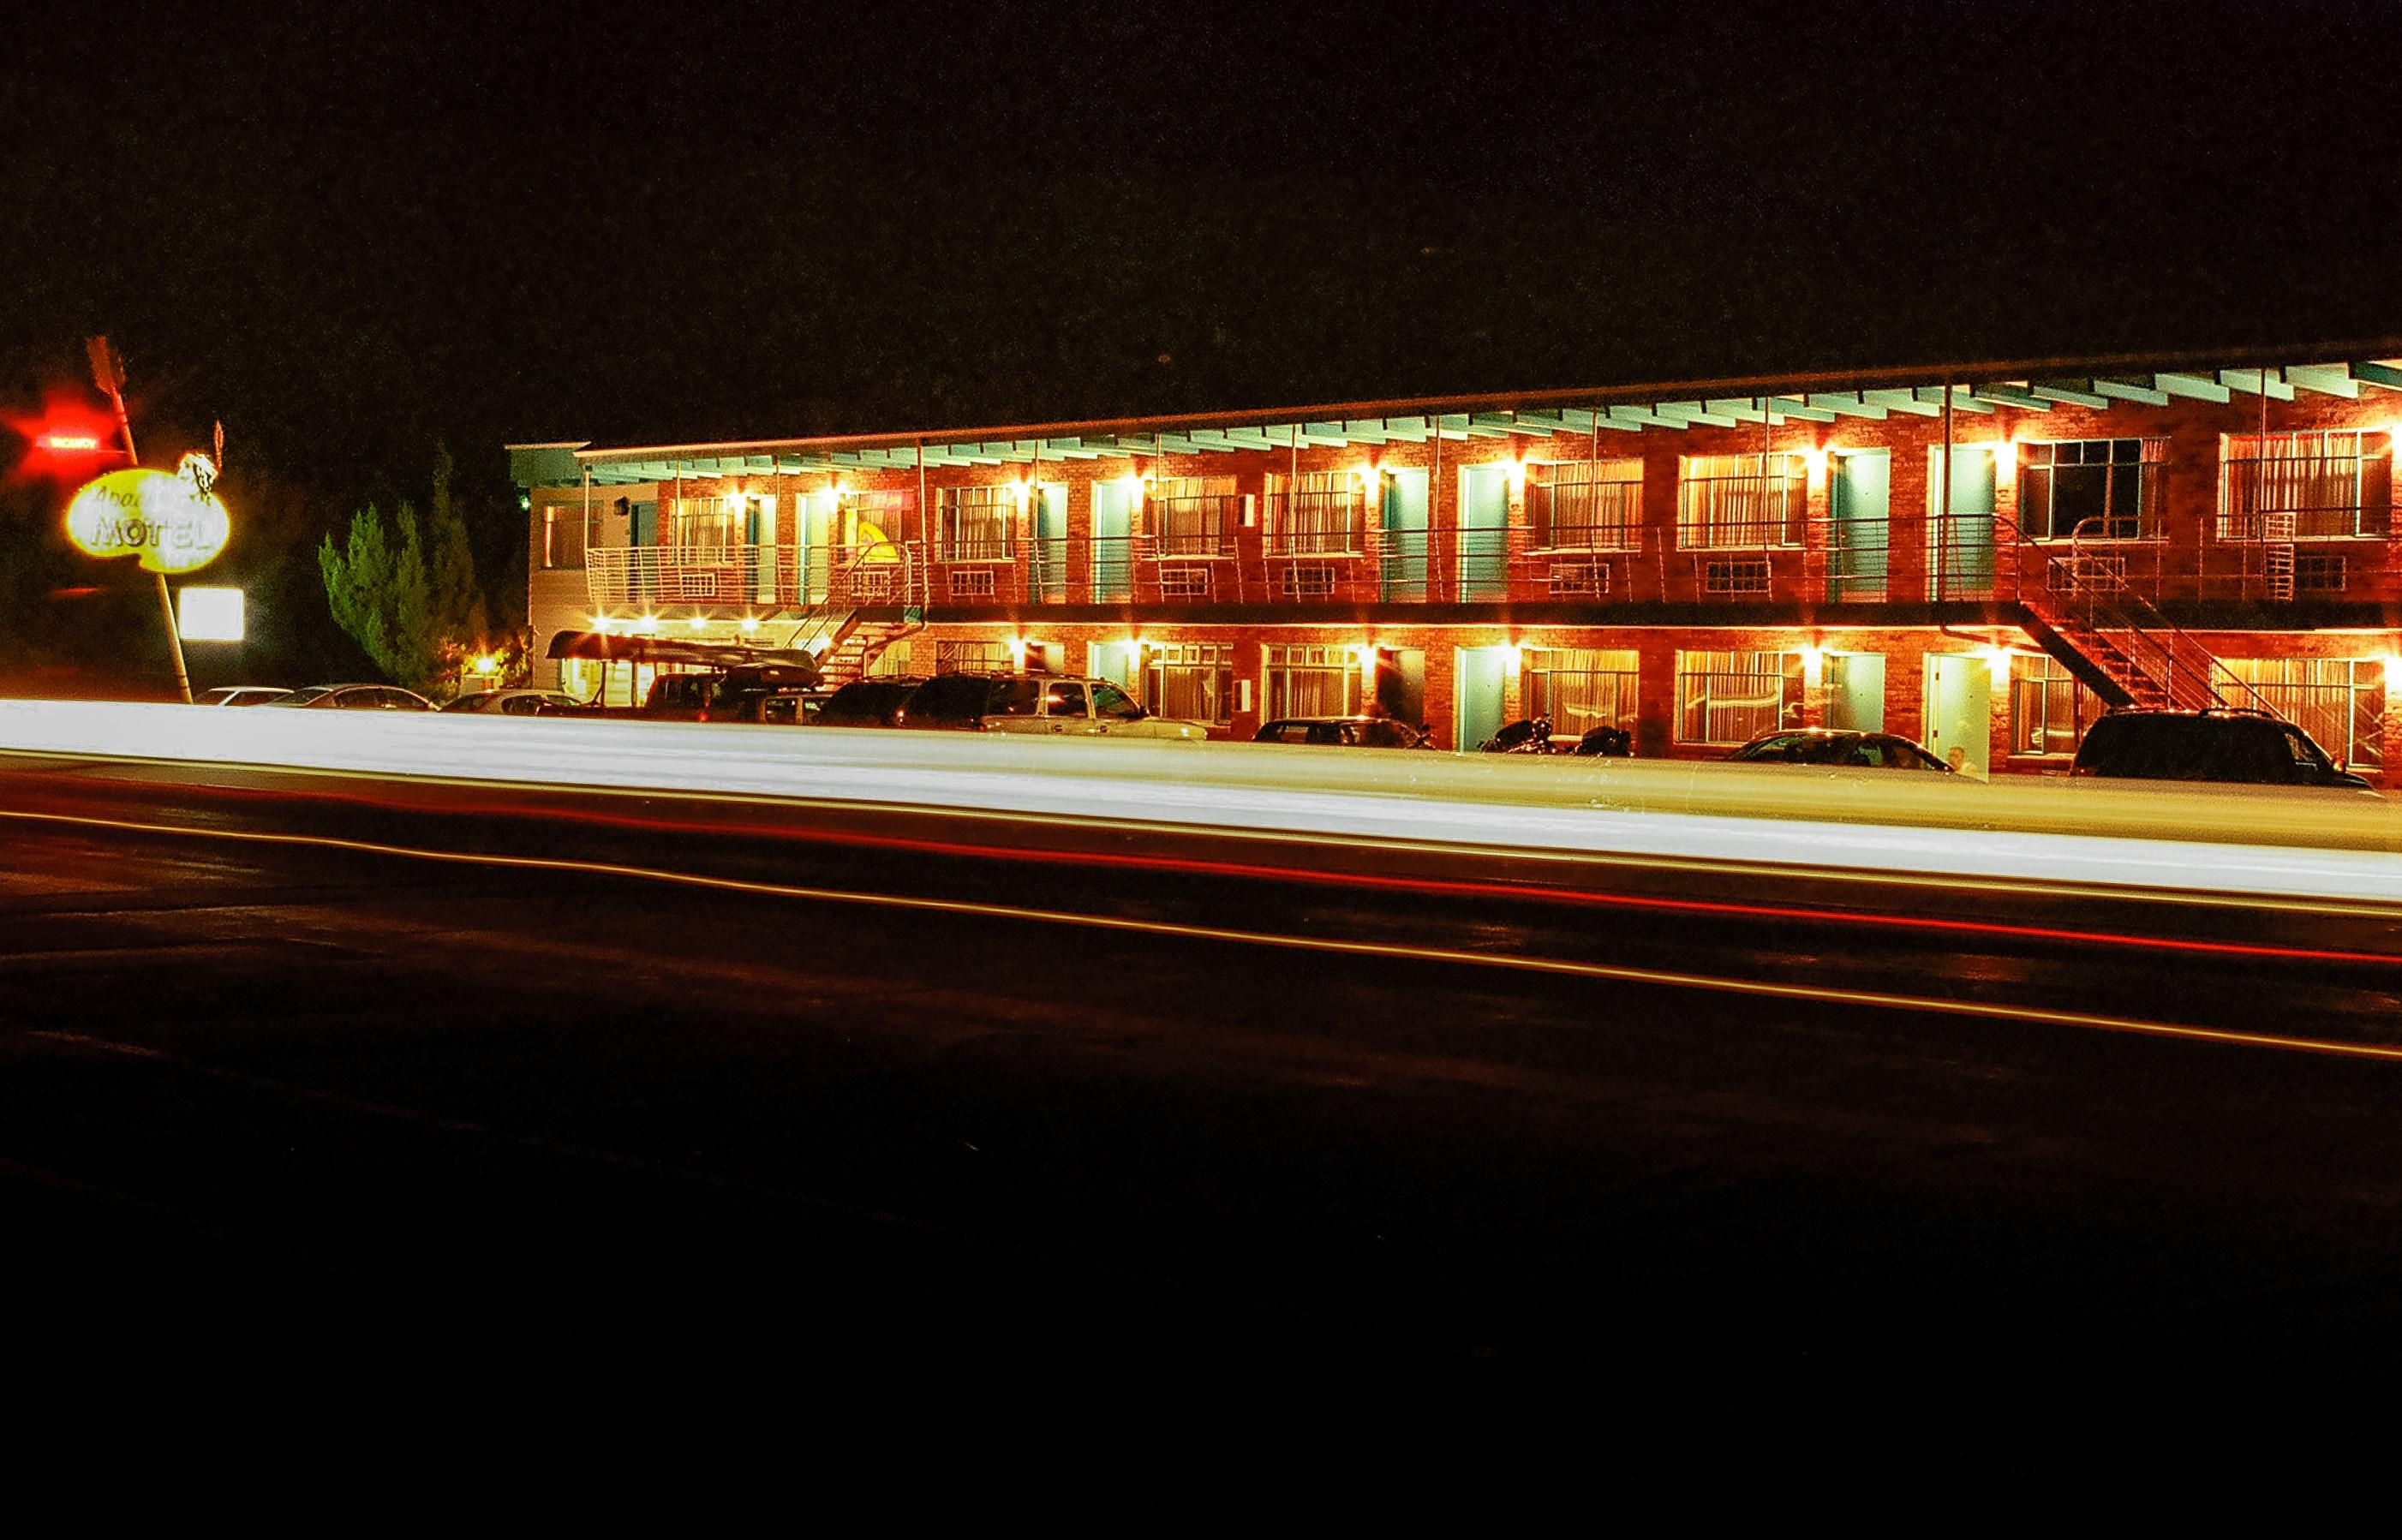 Night time, Apache Motel, Moab, Utah